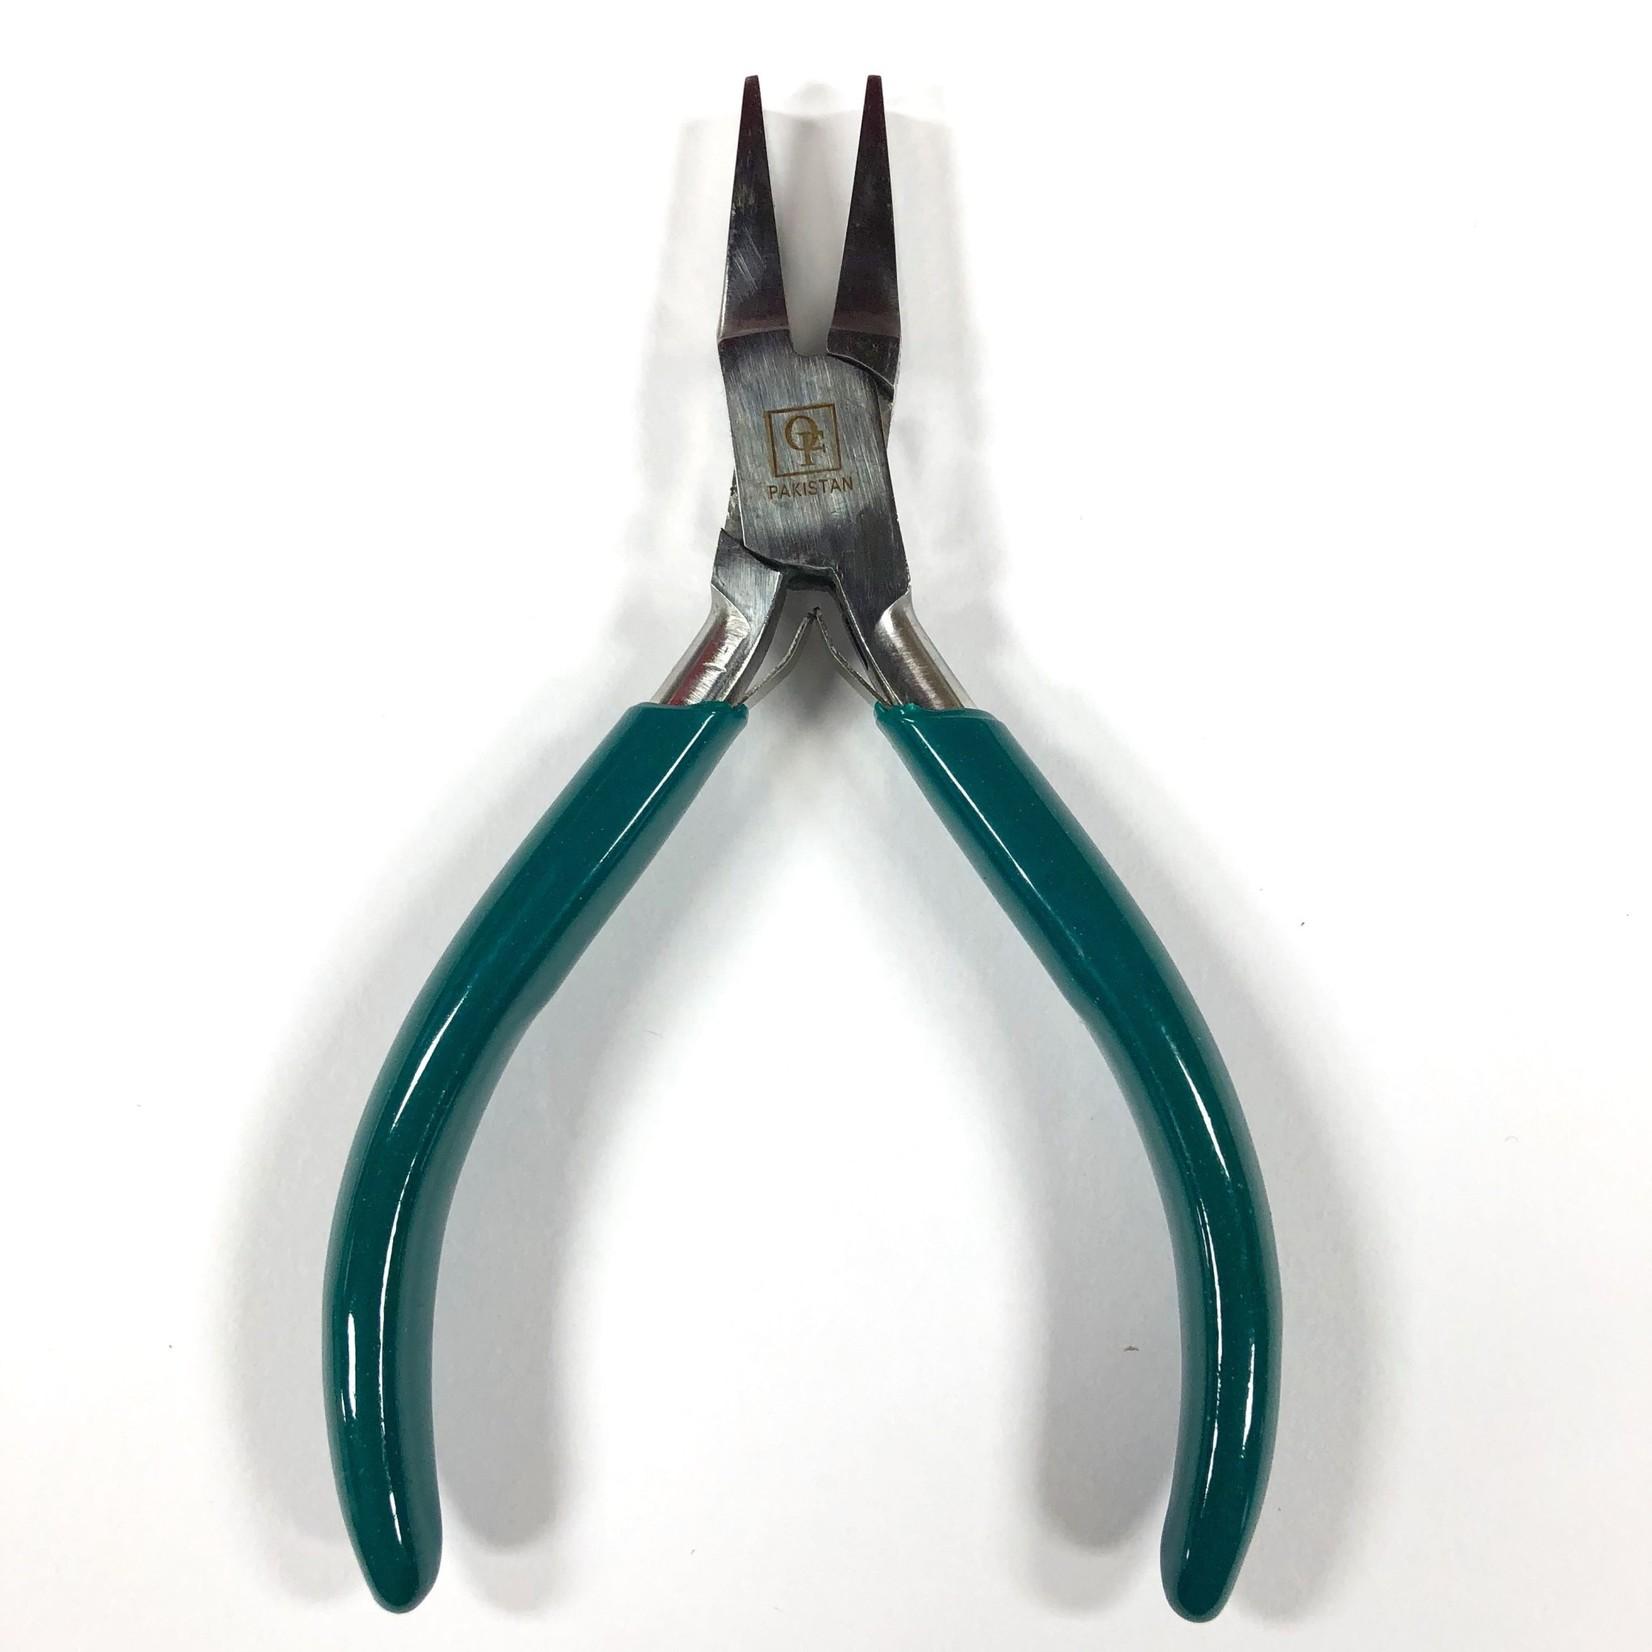 Carbon Steel Medium Duty Flat Nose PLIERS